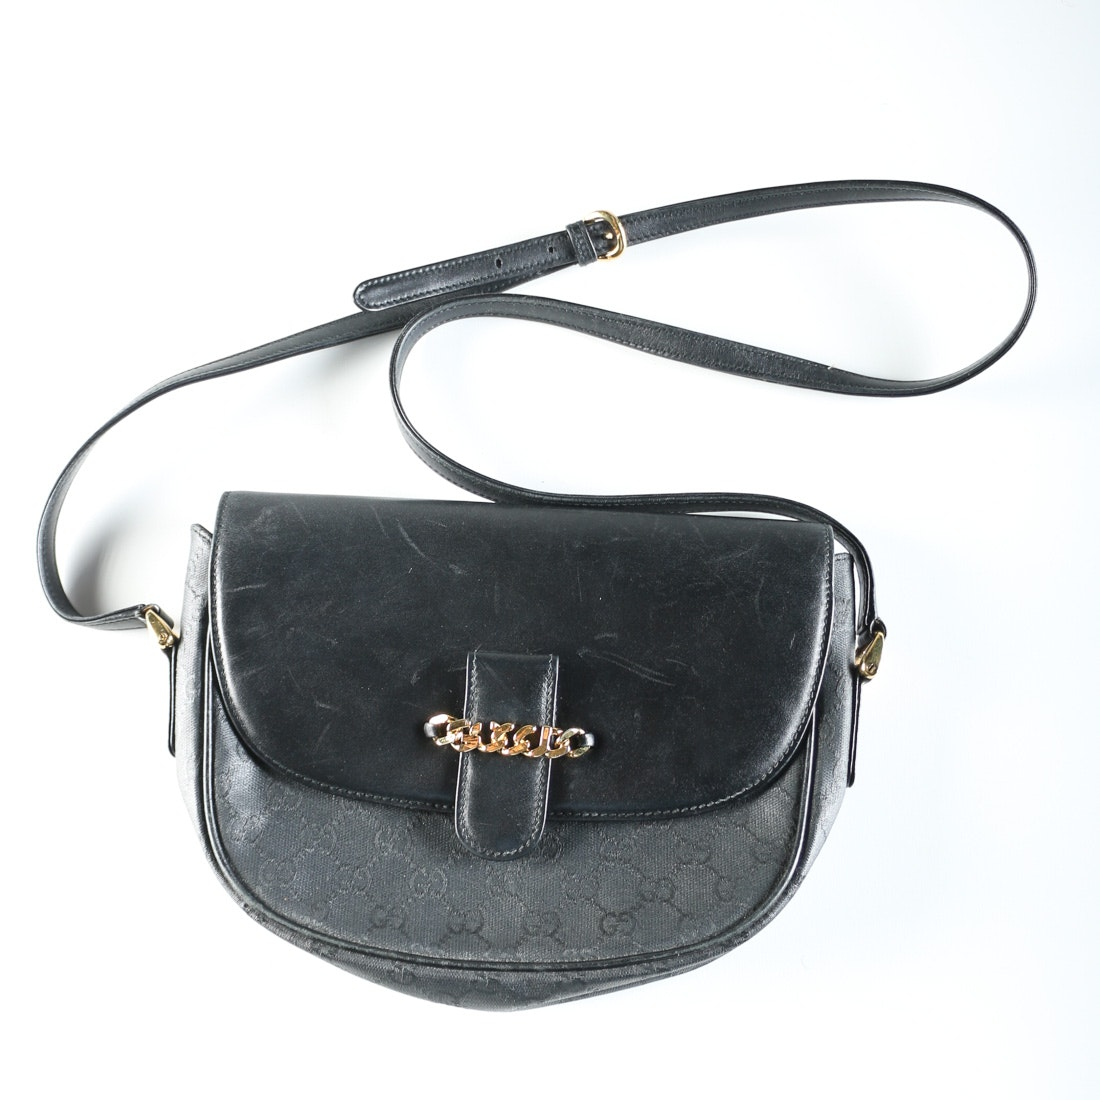 Vintage Black Leather Classic Gucci Bag